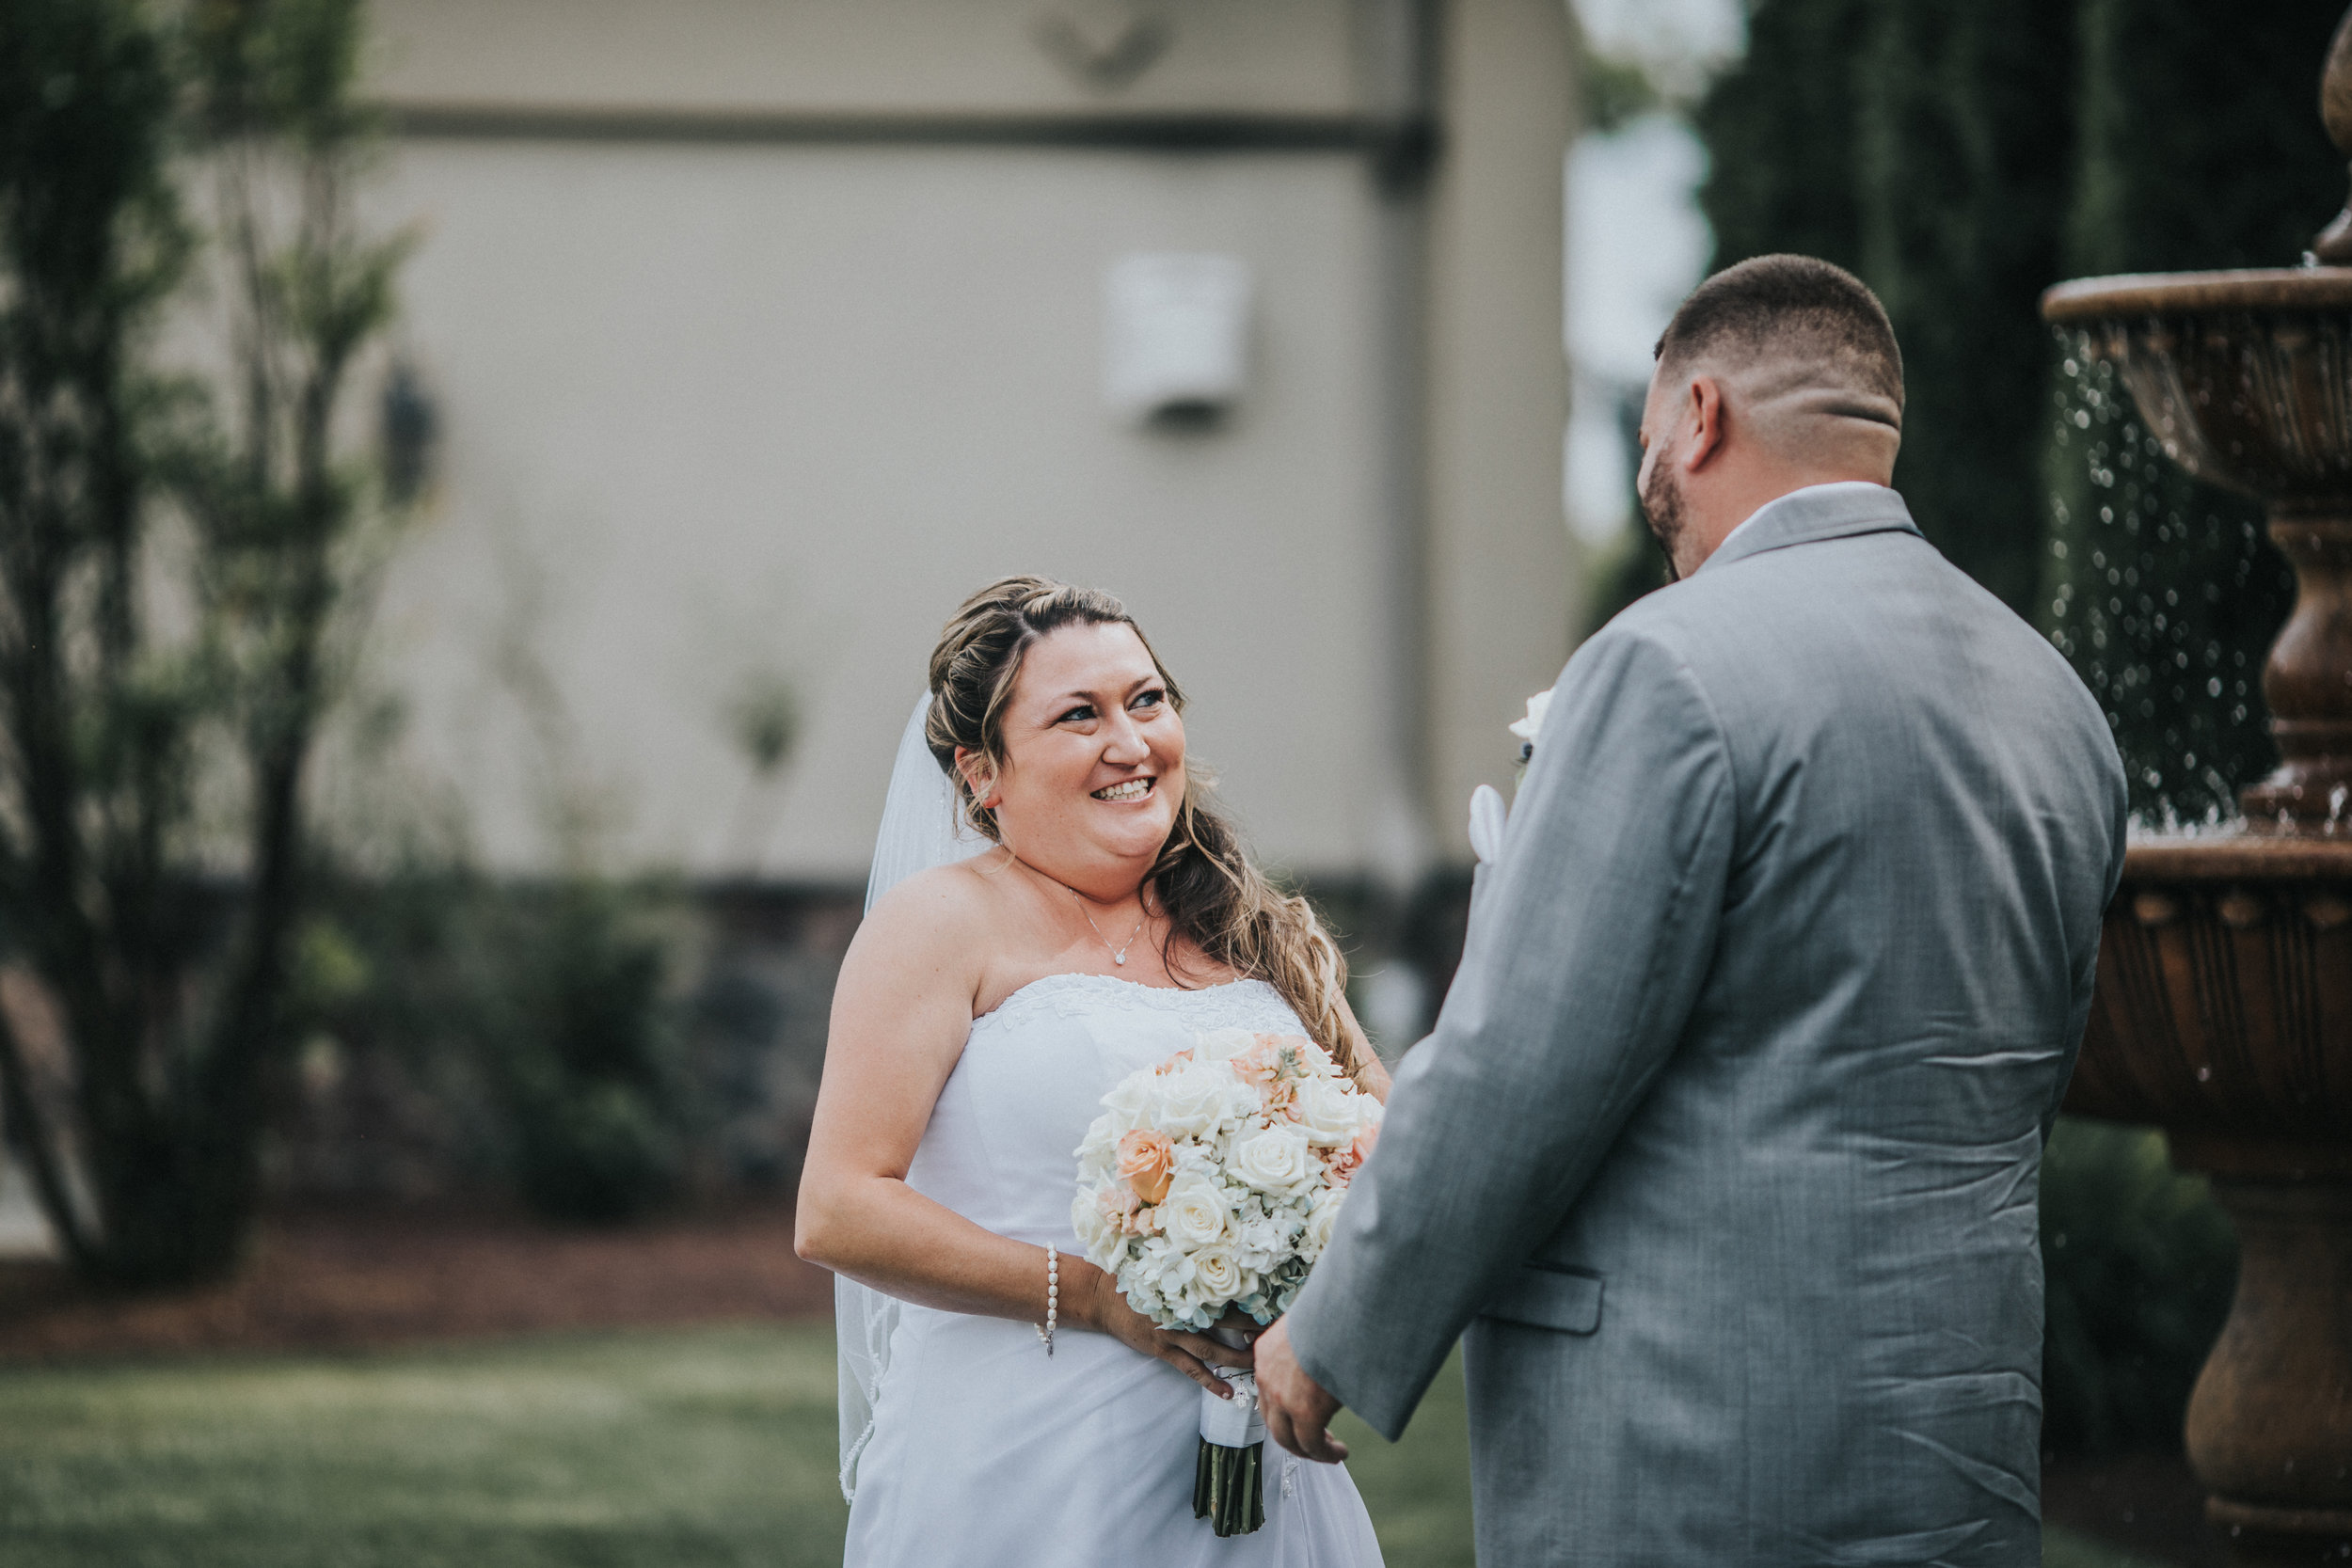 New-Jersey-Wedding-Photographer-JennaLynnPhotography-ValenzanoWinery-FirstLook-24.jpg